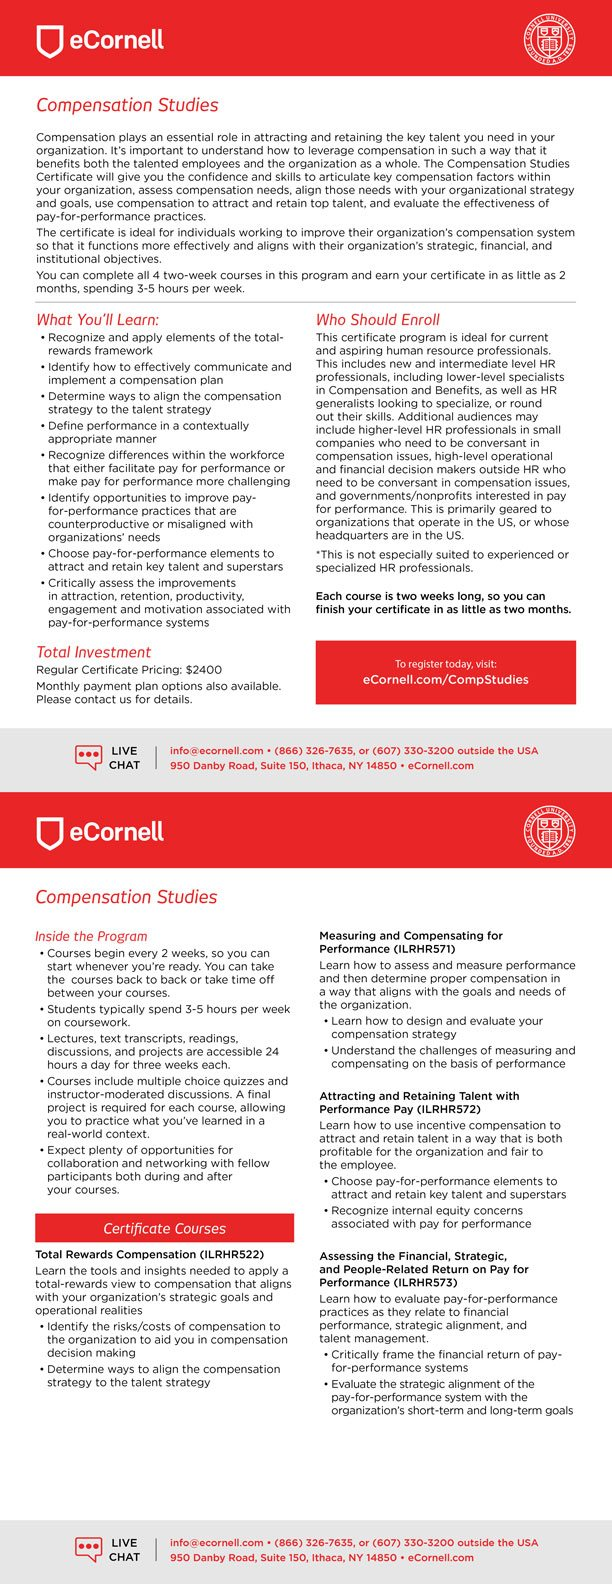 Compensation Studies Flyer